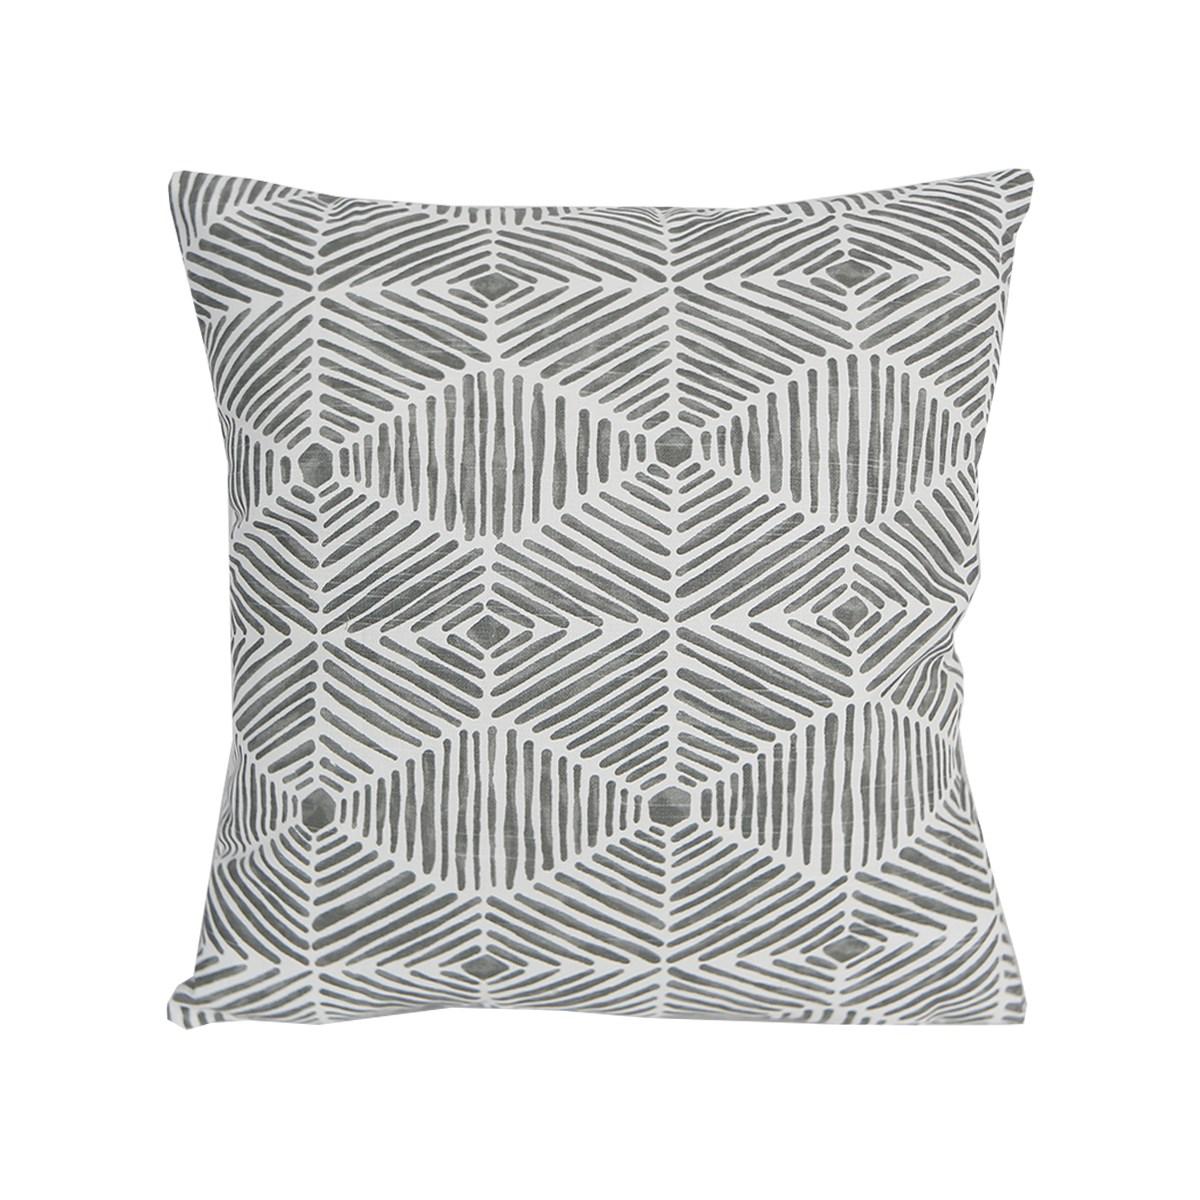 Grid gray